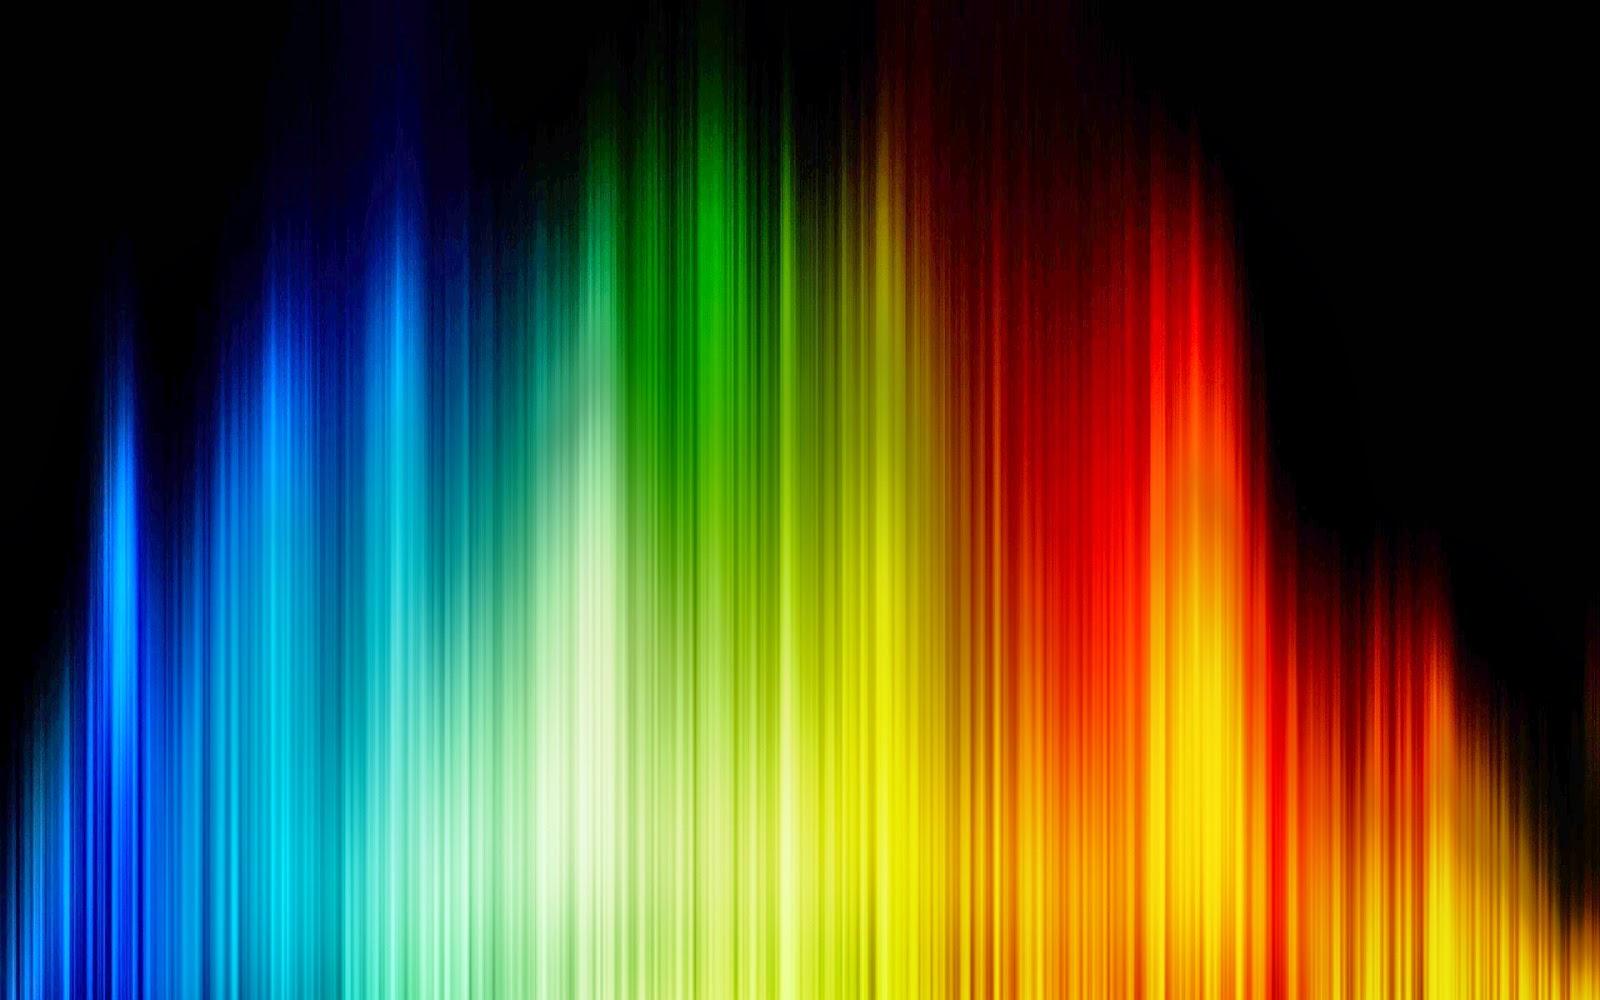 Color Splash Rainbow Of colors splashing across: galleryhip.com/color-splash-rainbow.html